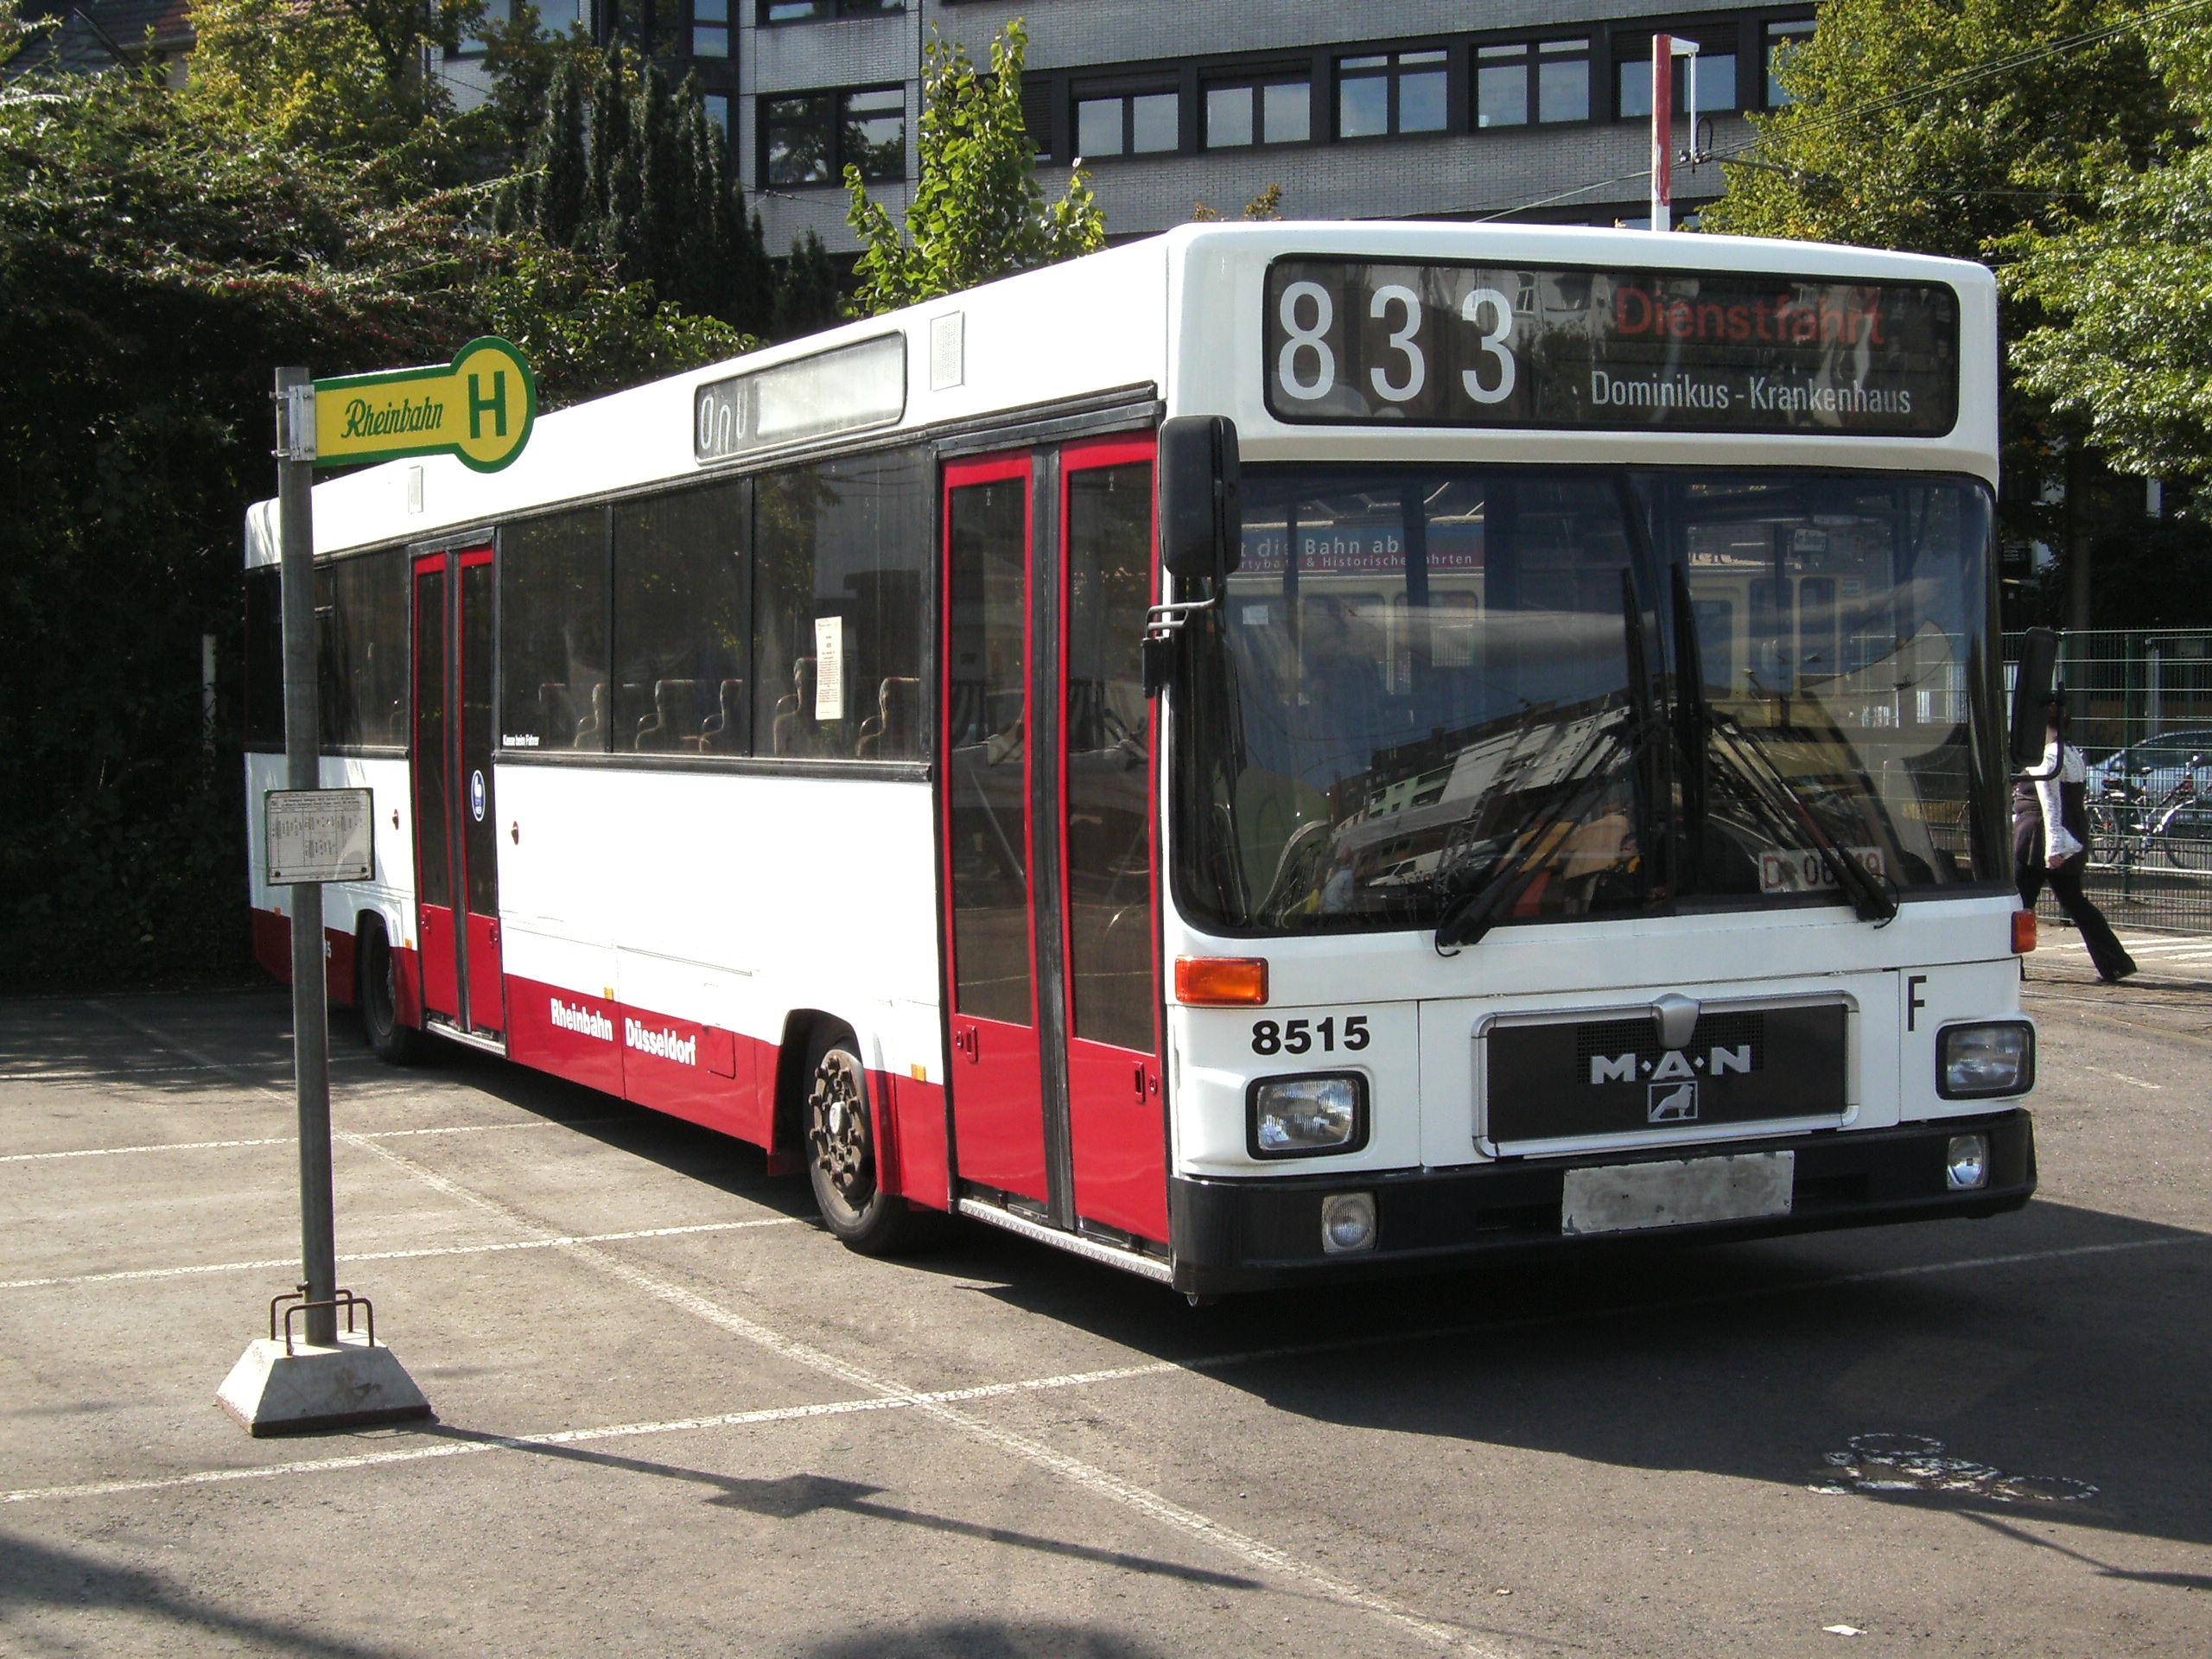 File:Linie 833-1 (Rheinbahn).jpg